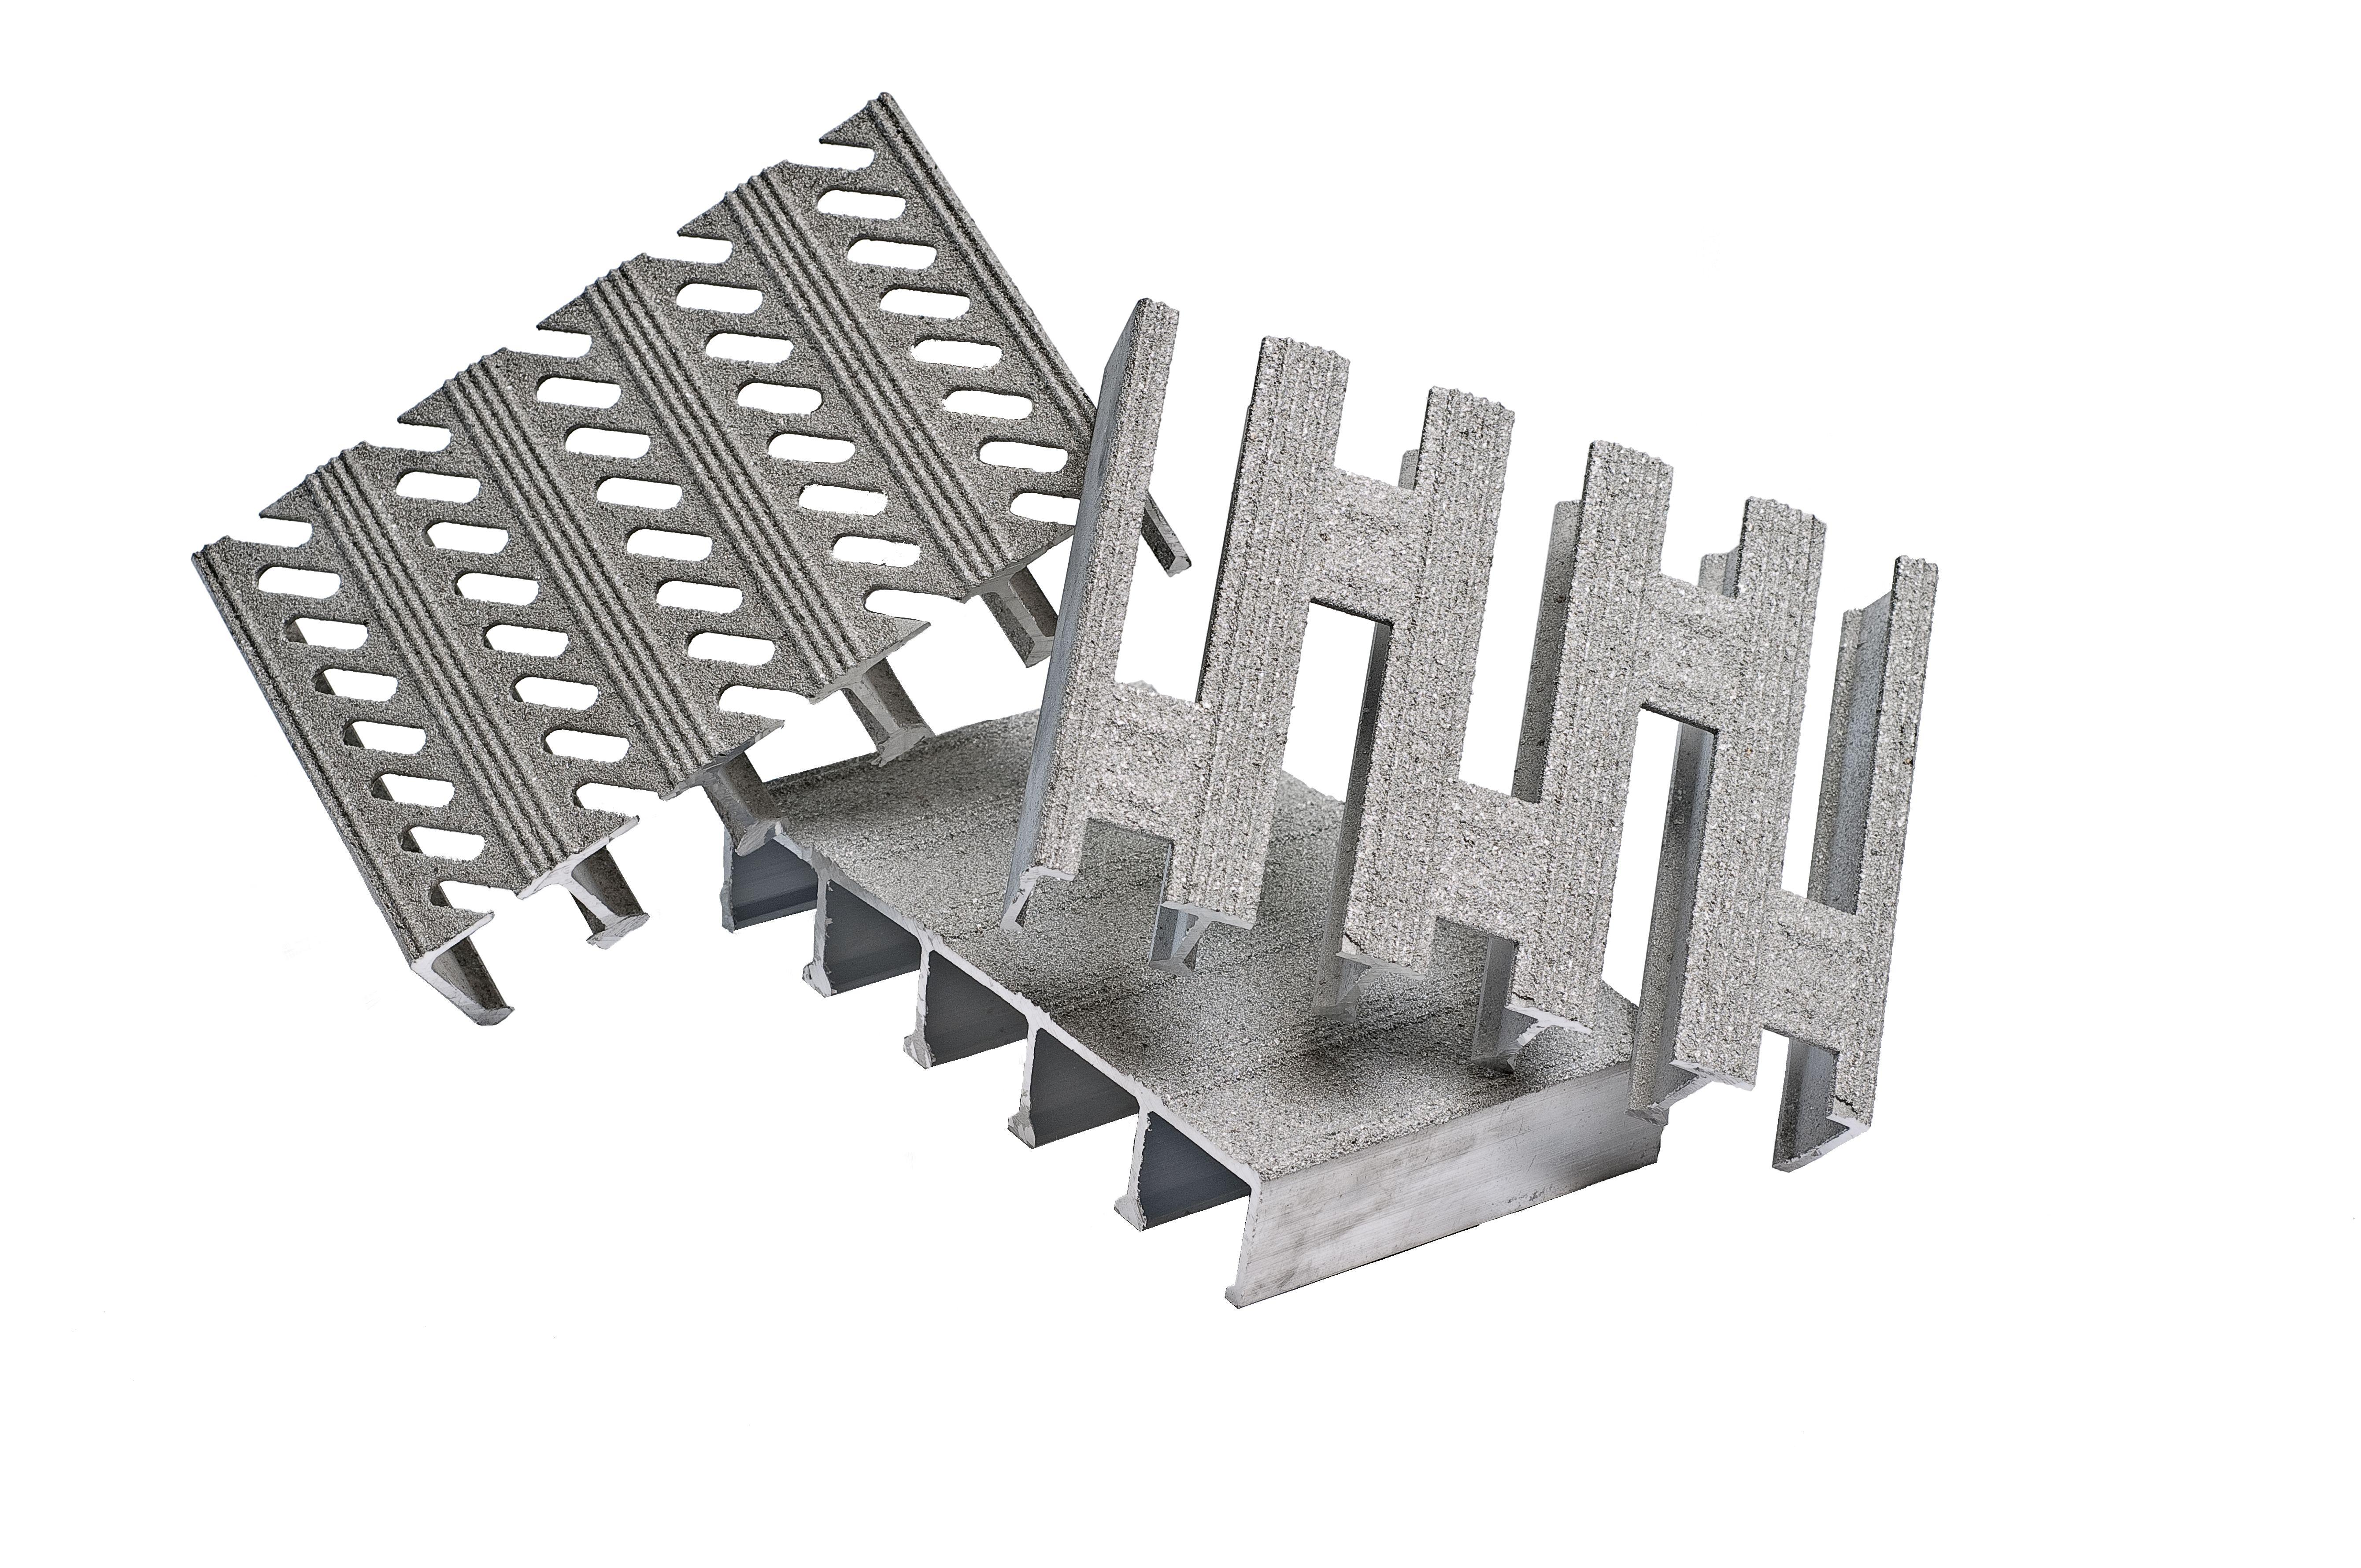 Plank Slipnot Aluminum Plank Provides A Strong Lightweight Flooring Alternative To Bar Grating And Fiberglass Punched Plank Aluminum Planks Plank Aluminum